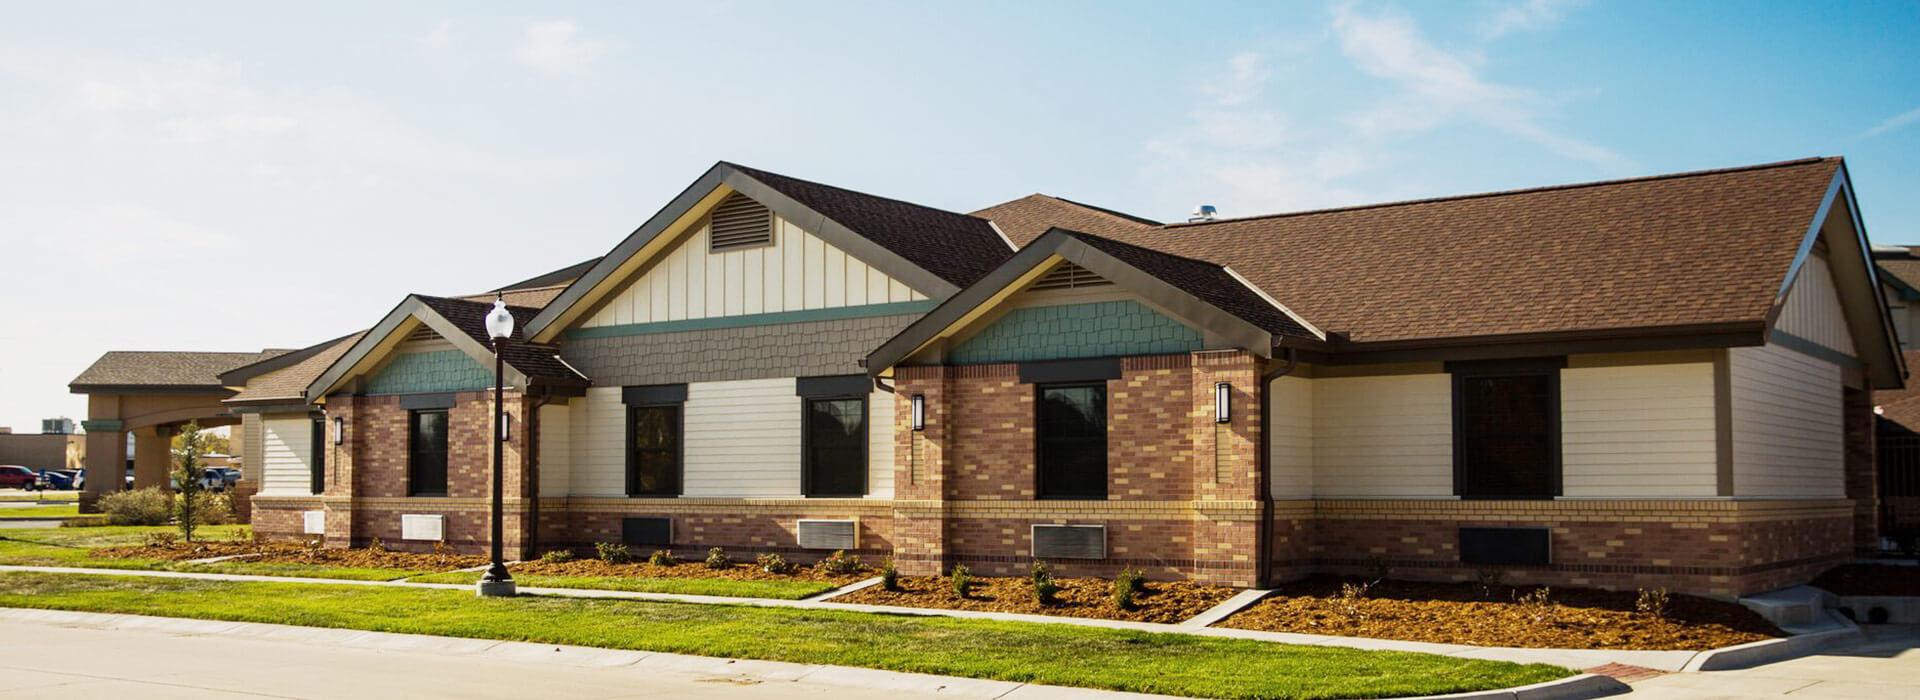 the-cedars-assisted-living-facility-desktop